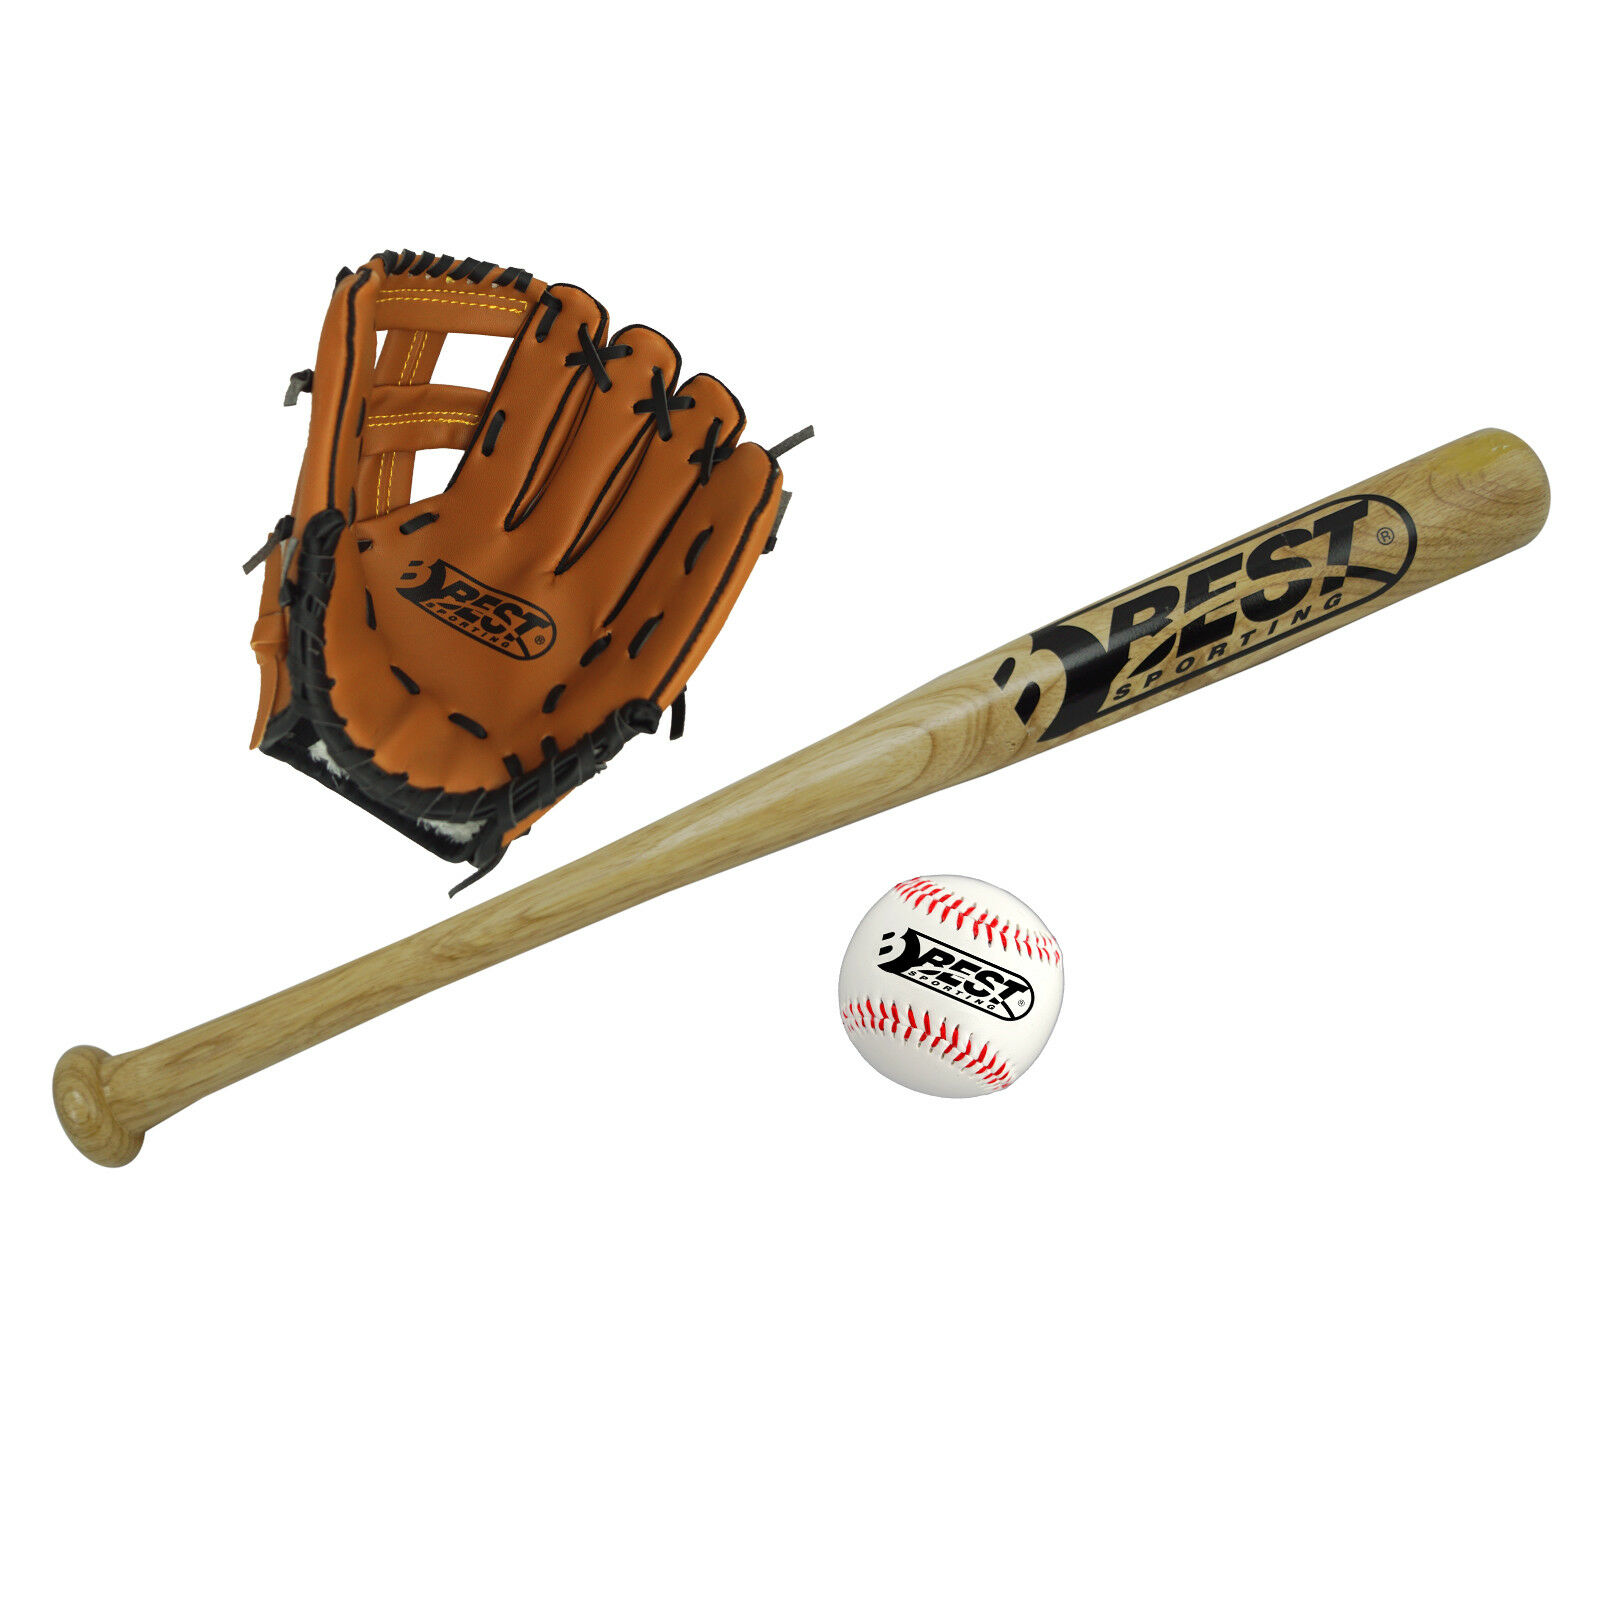 Best Sporting Baseballschläger Baseballkeule Holz Holzschläger 66 oder 81 cm